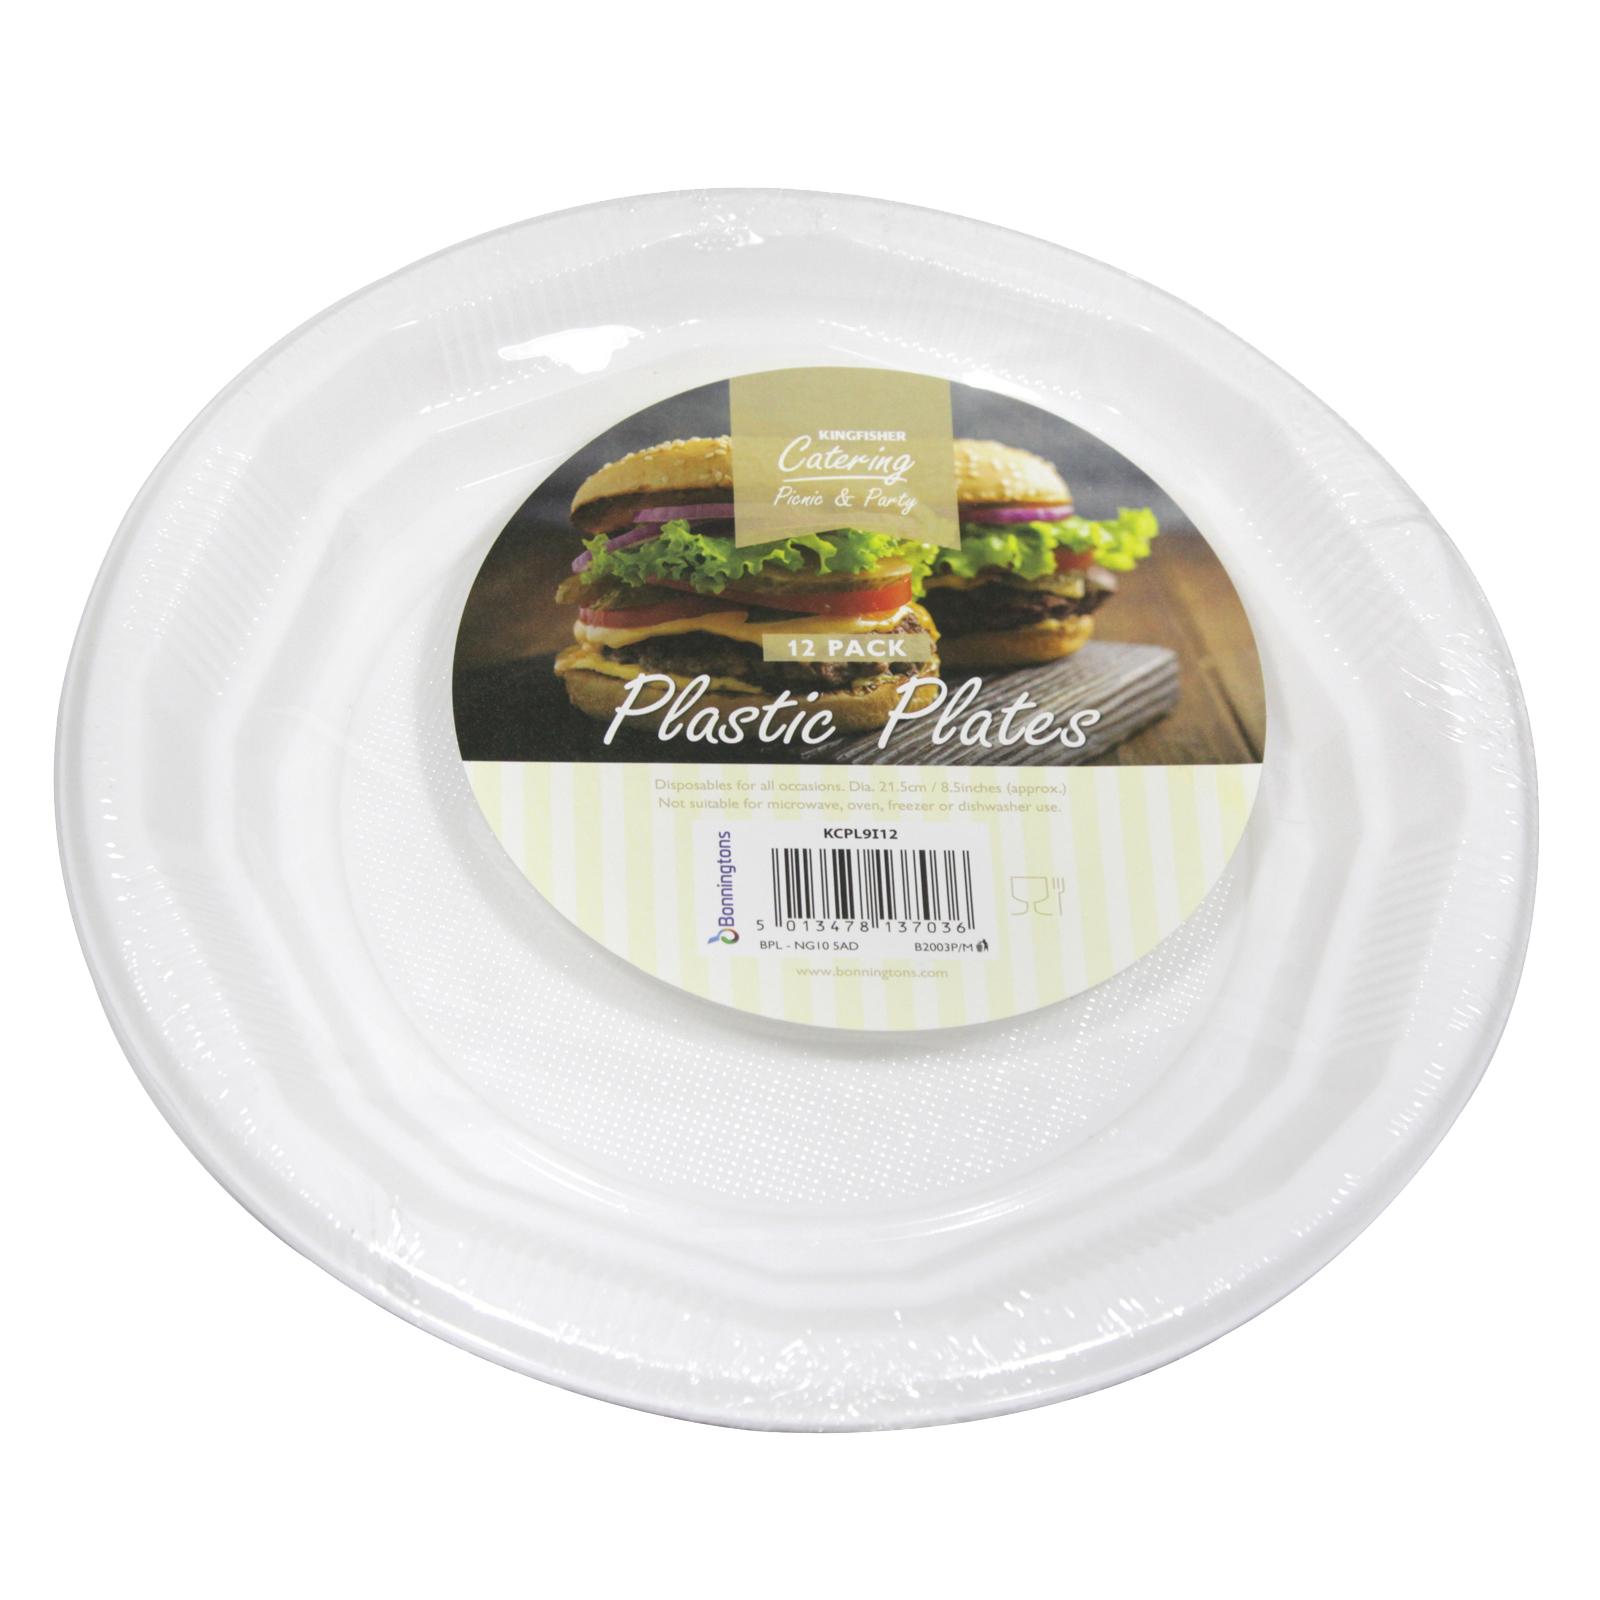 KINGFISHER 12 PLASTIC PLATES 8.5